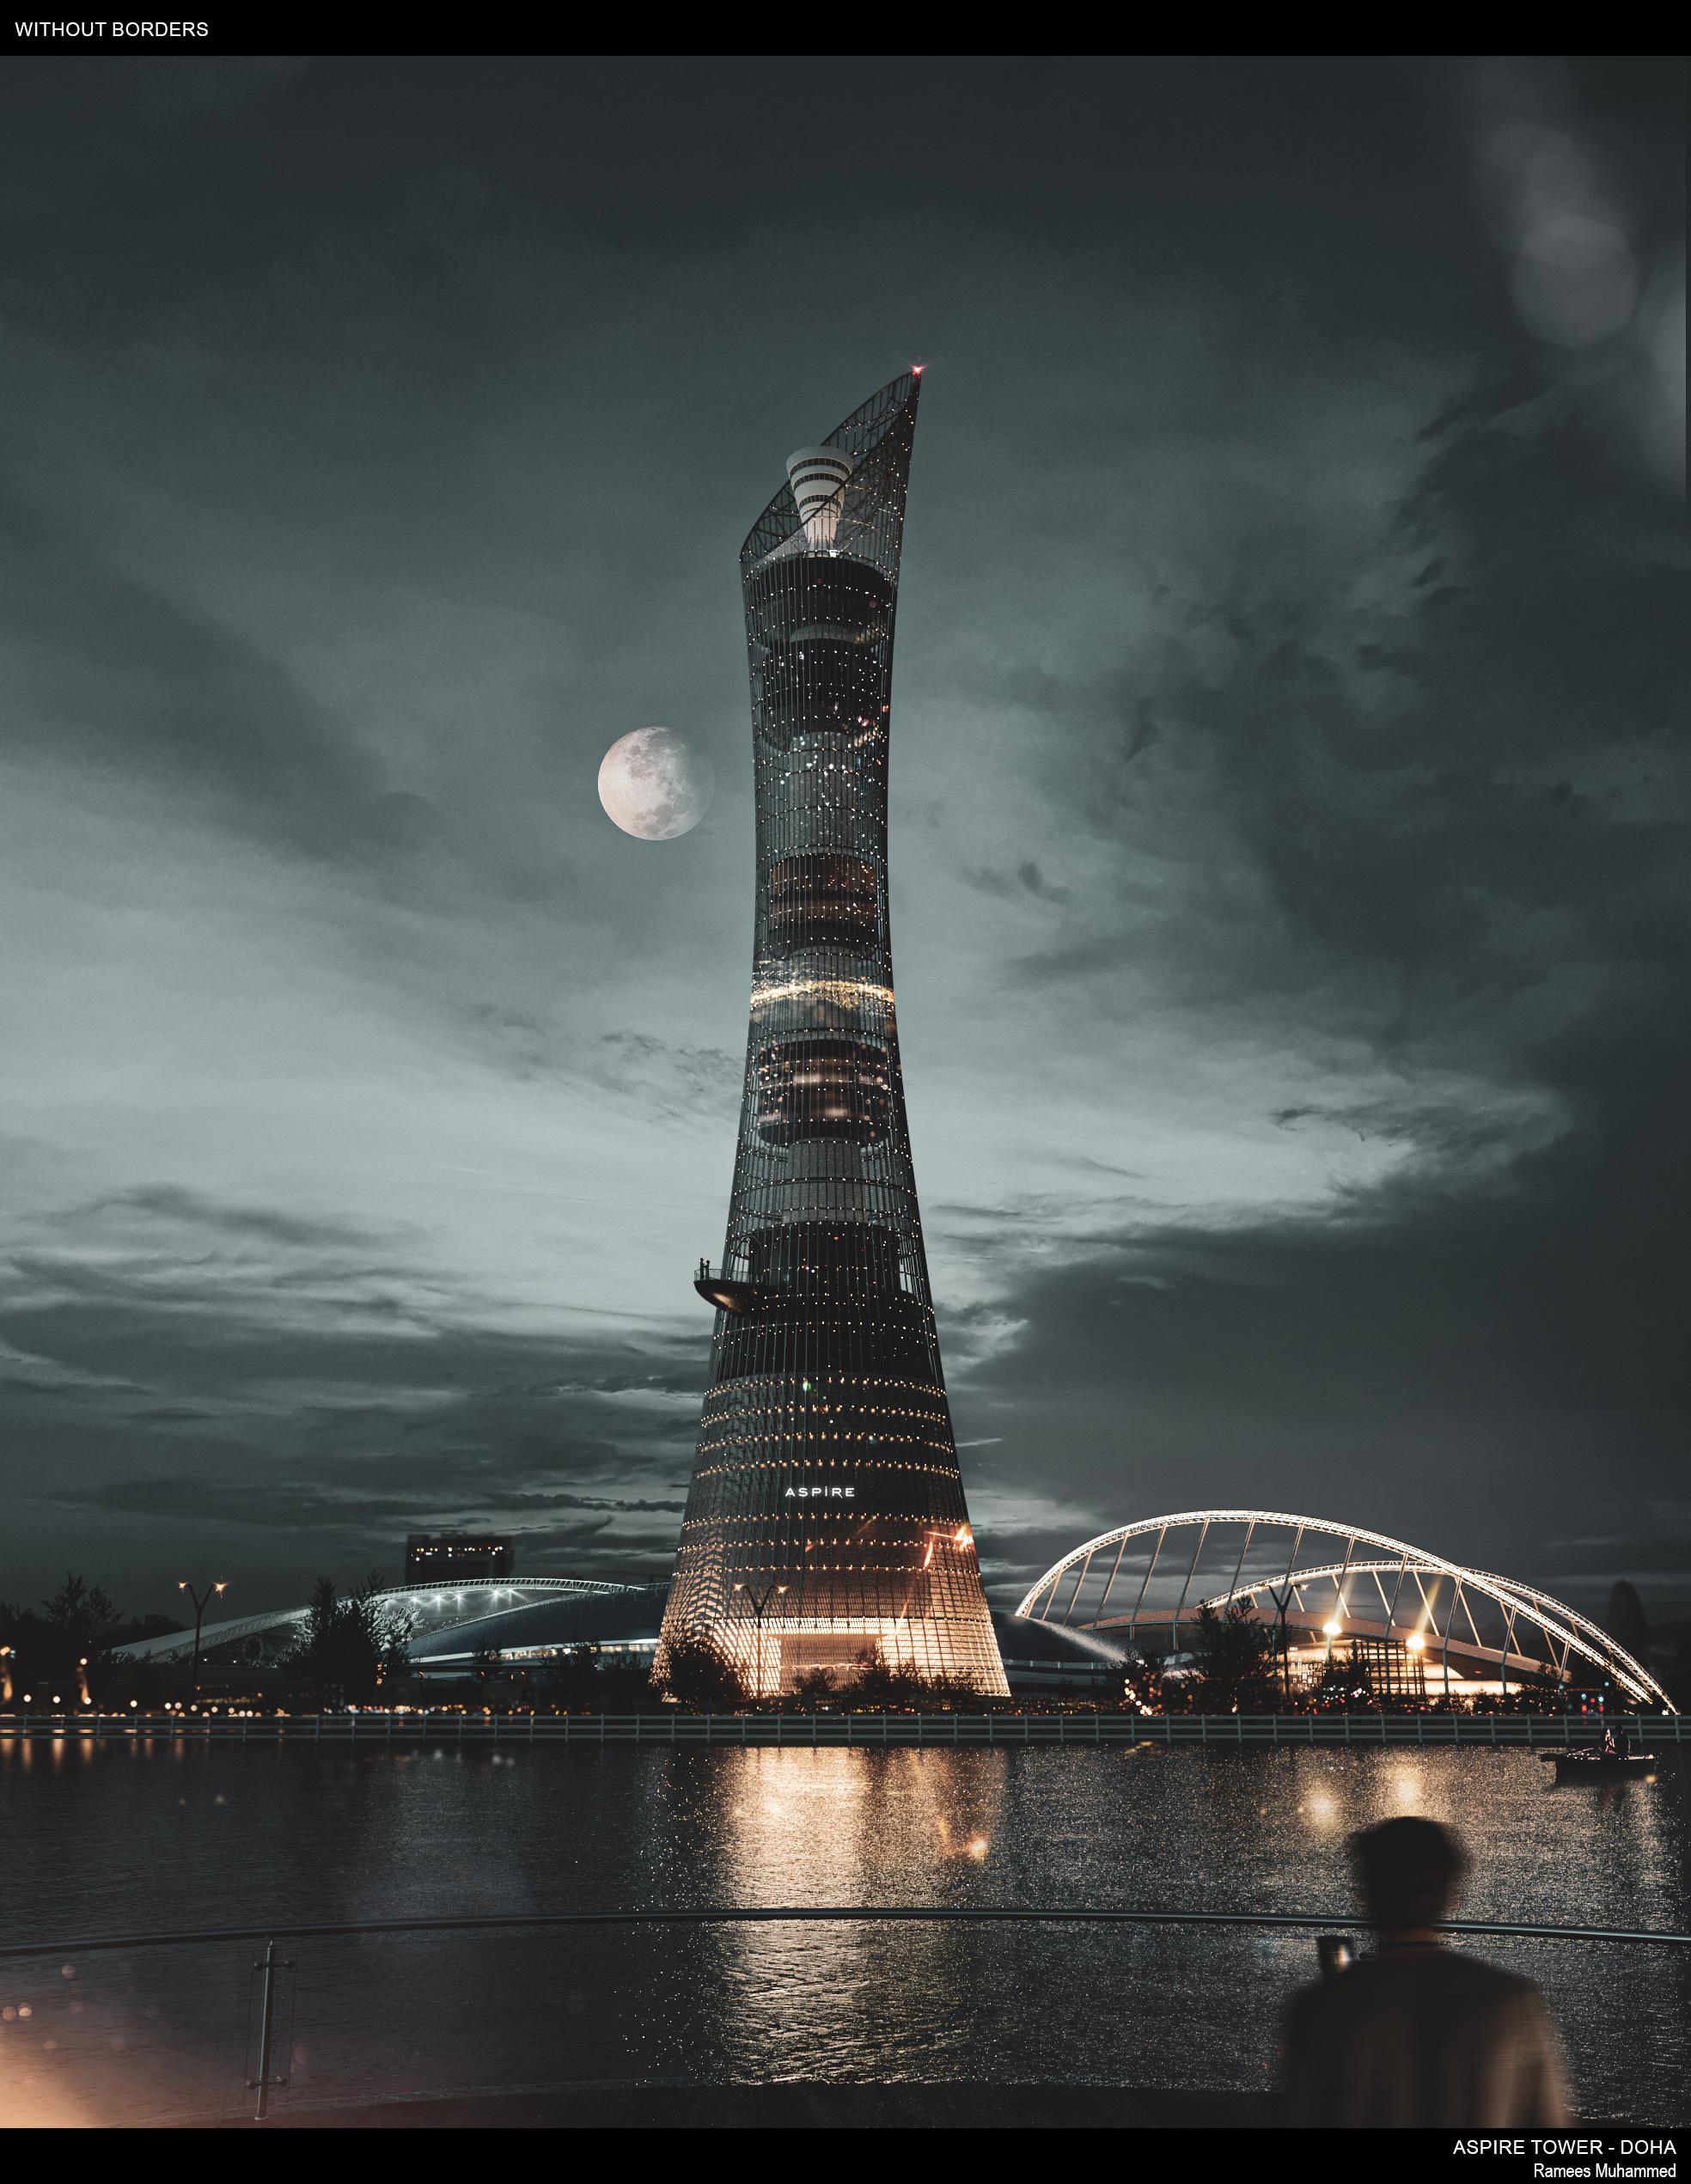 Aspire Tower - Doha, Qatar 3d art